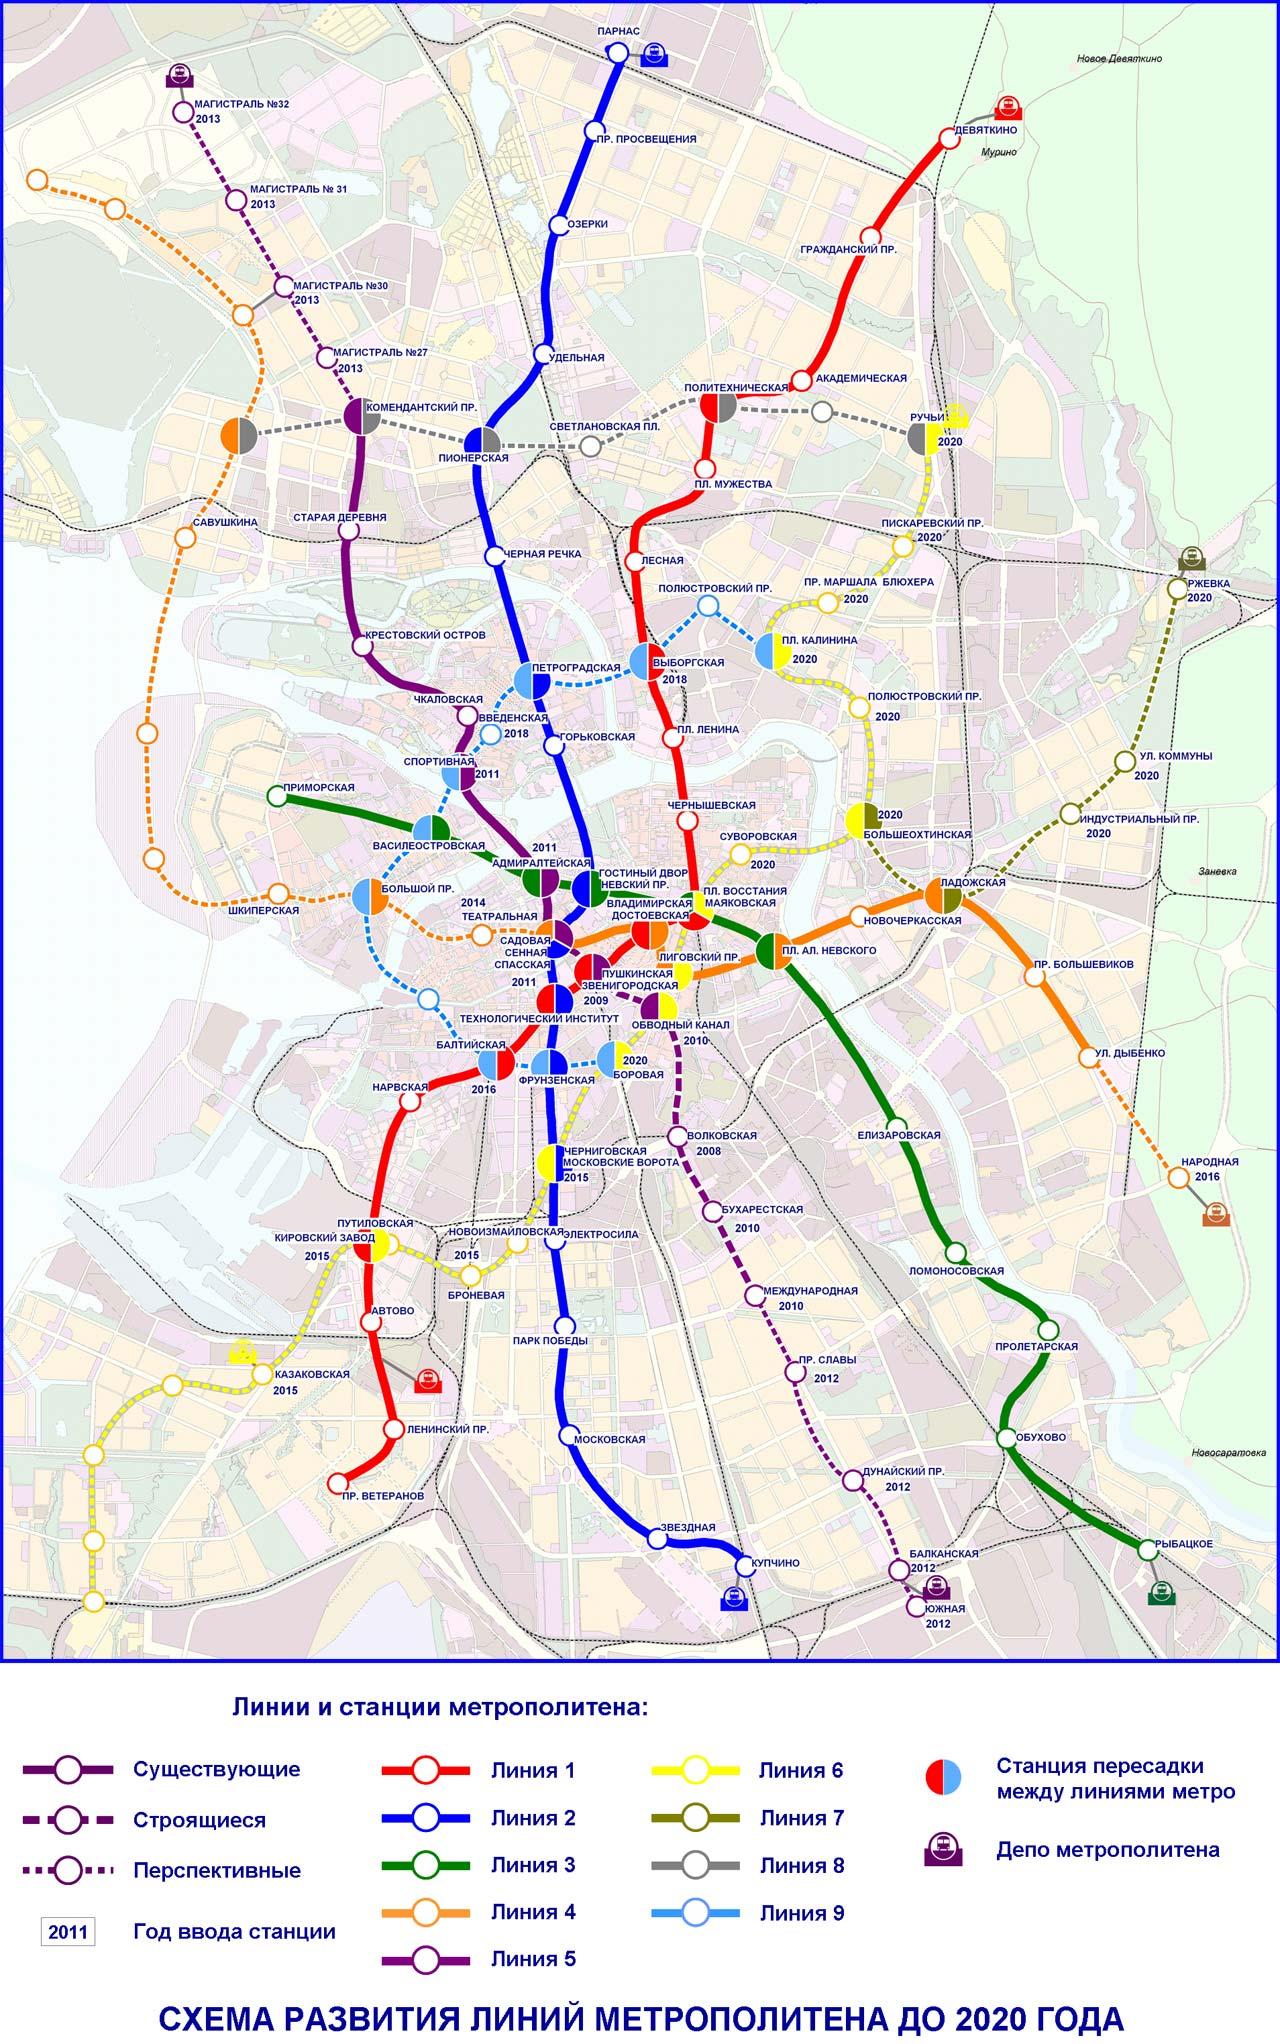 Карта карта метрополитена города санкт петербурга